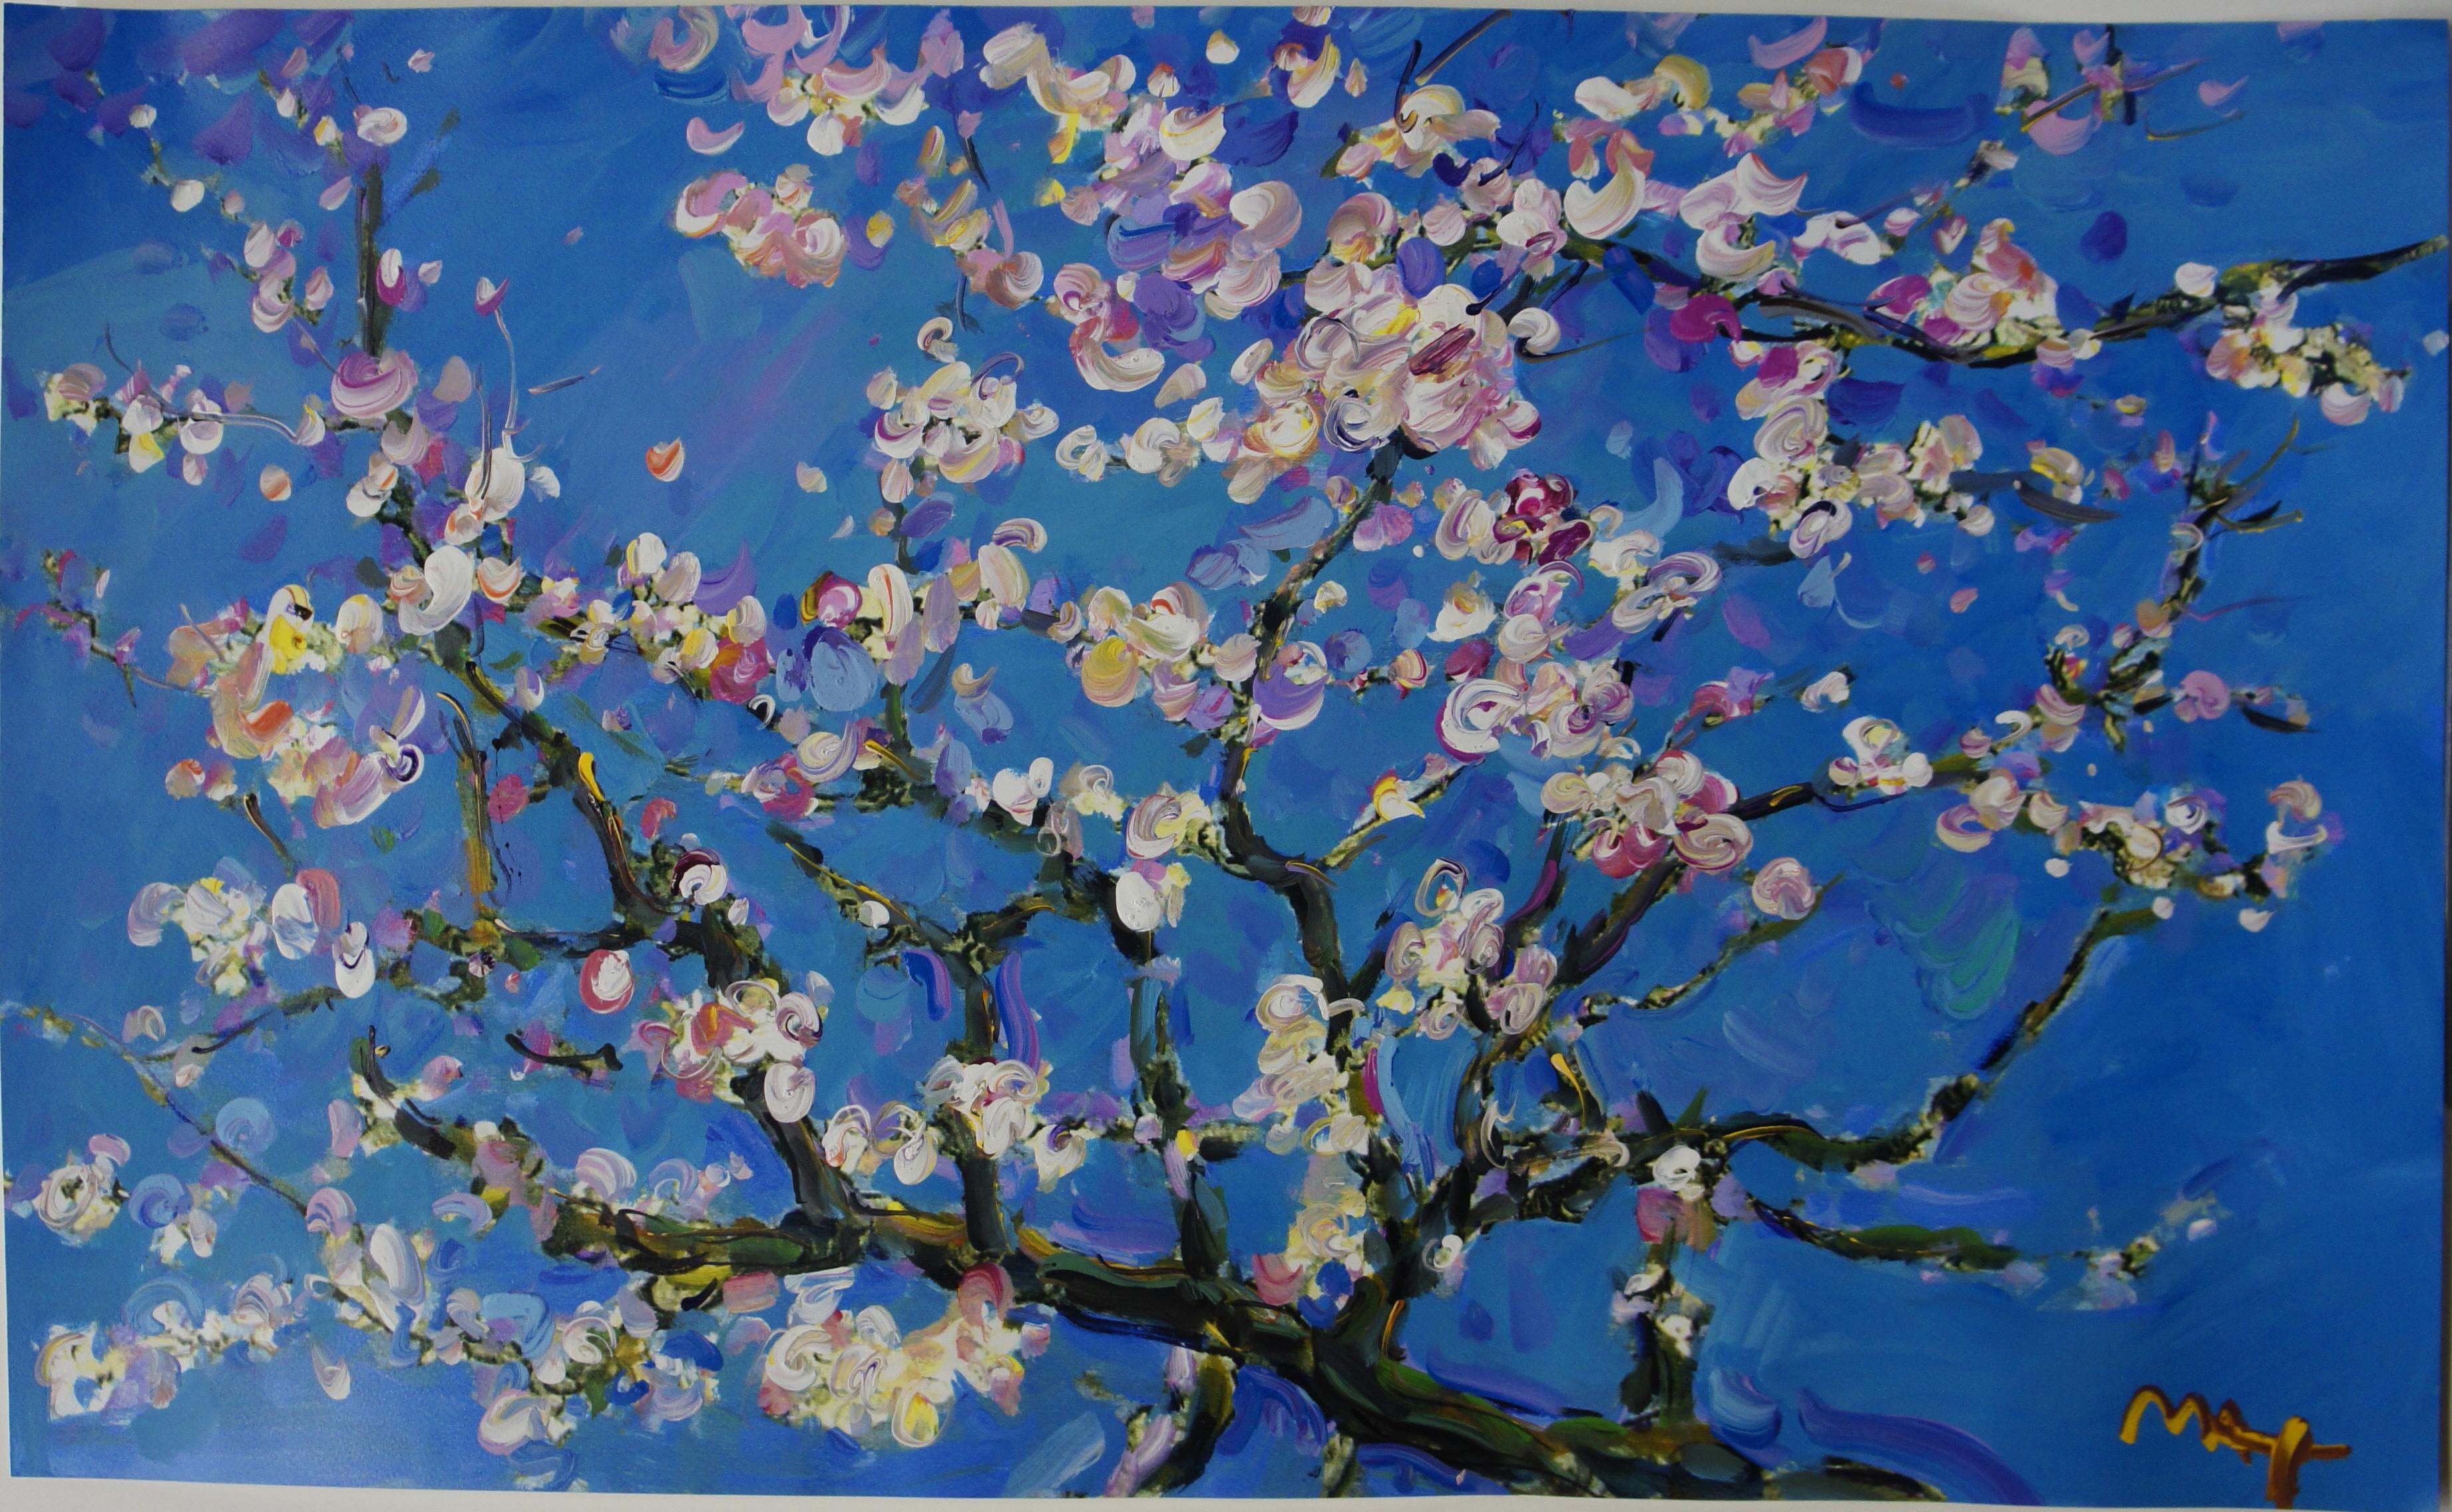 Homage to Van Gogh  Almond Blossom Ver II 3 3684x2272